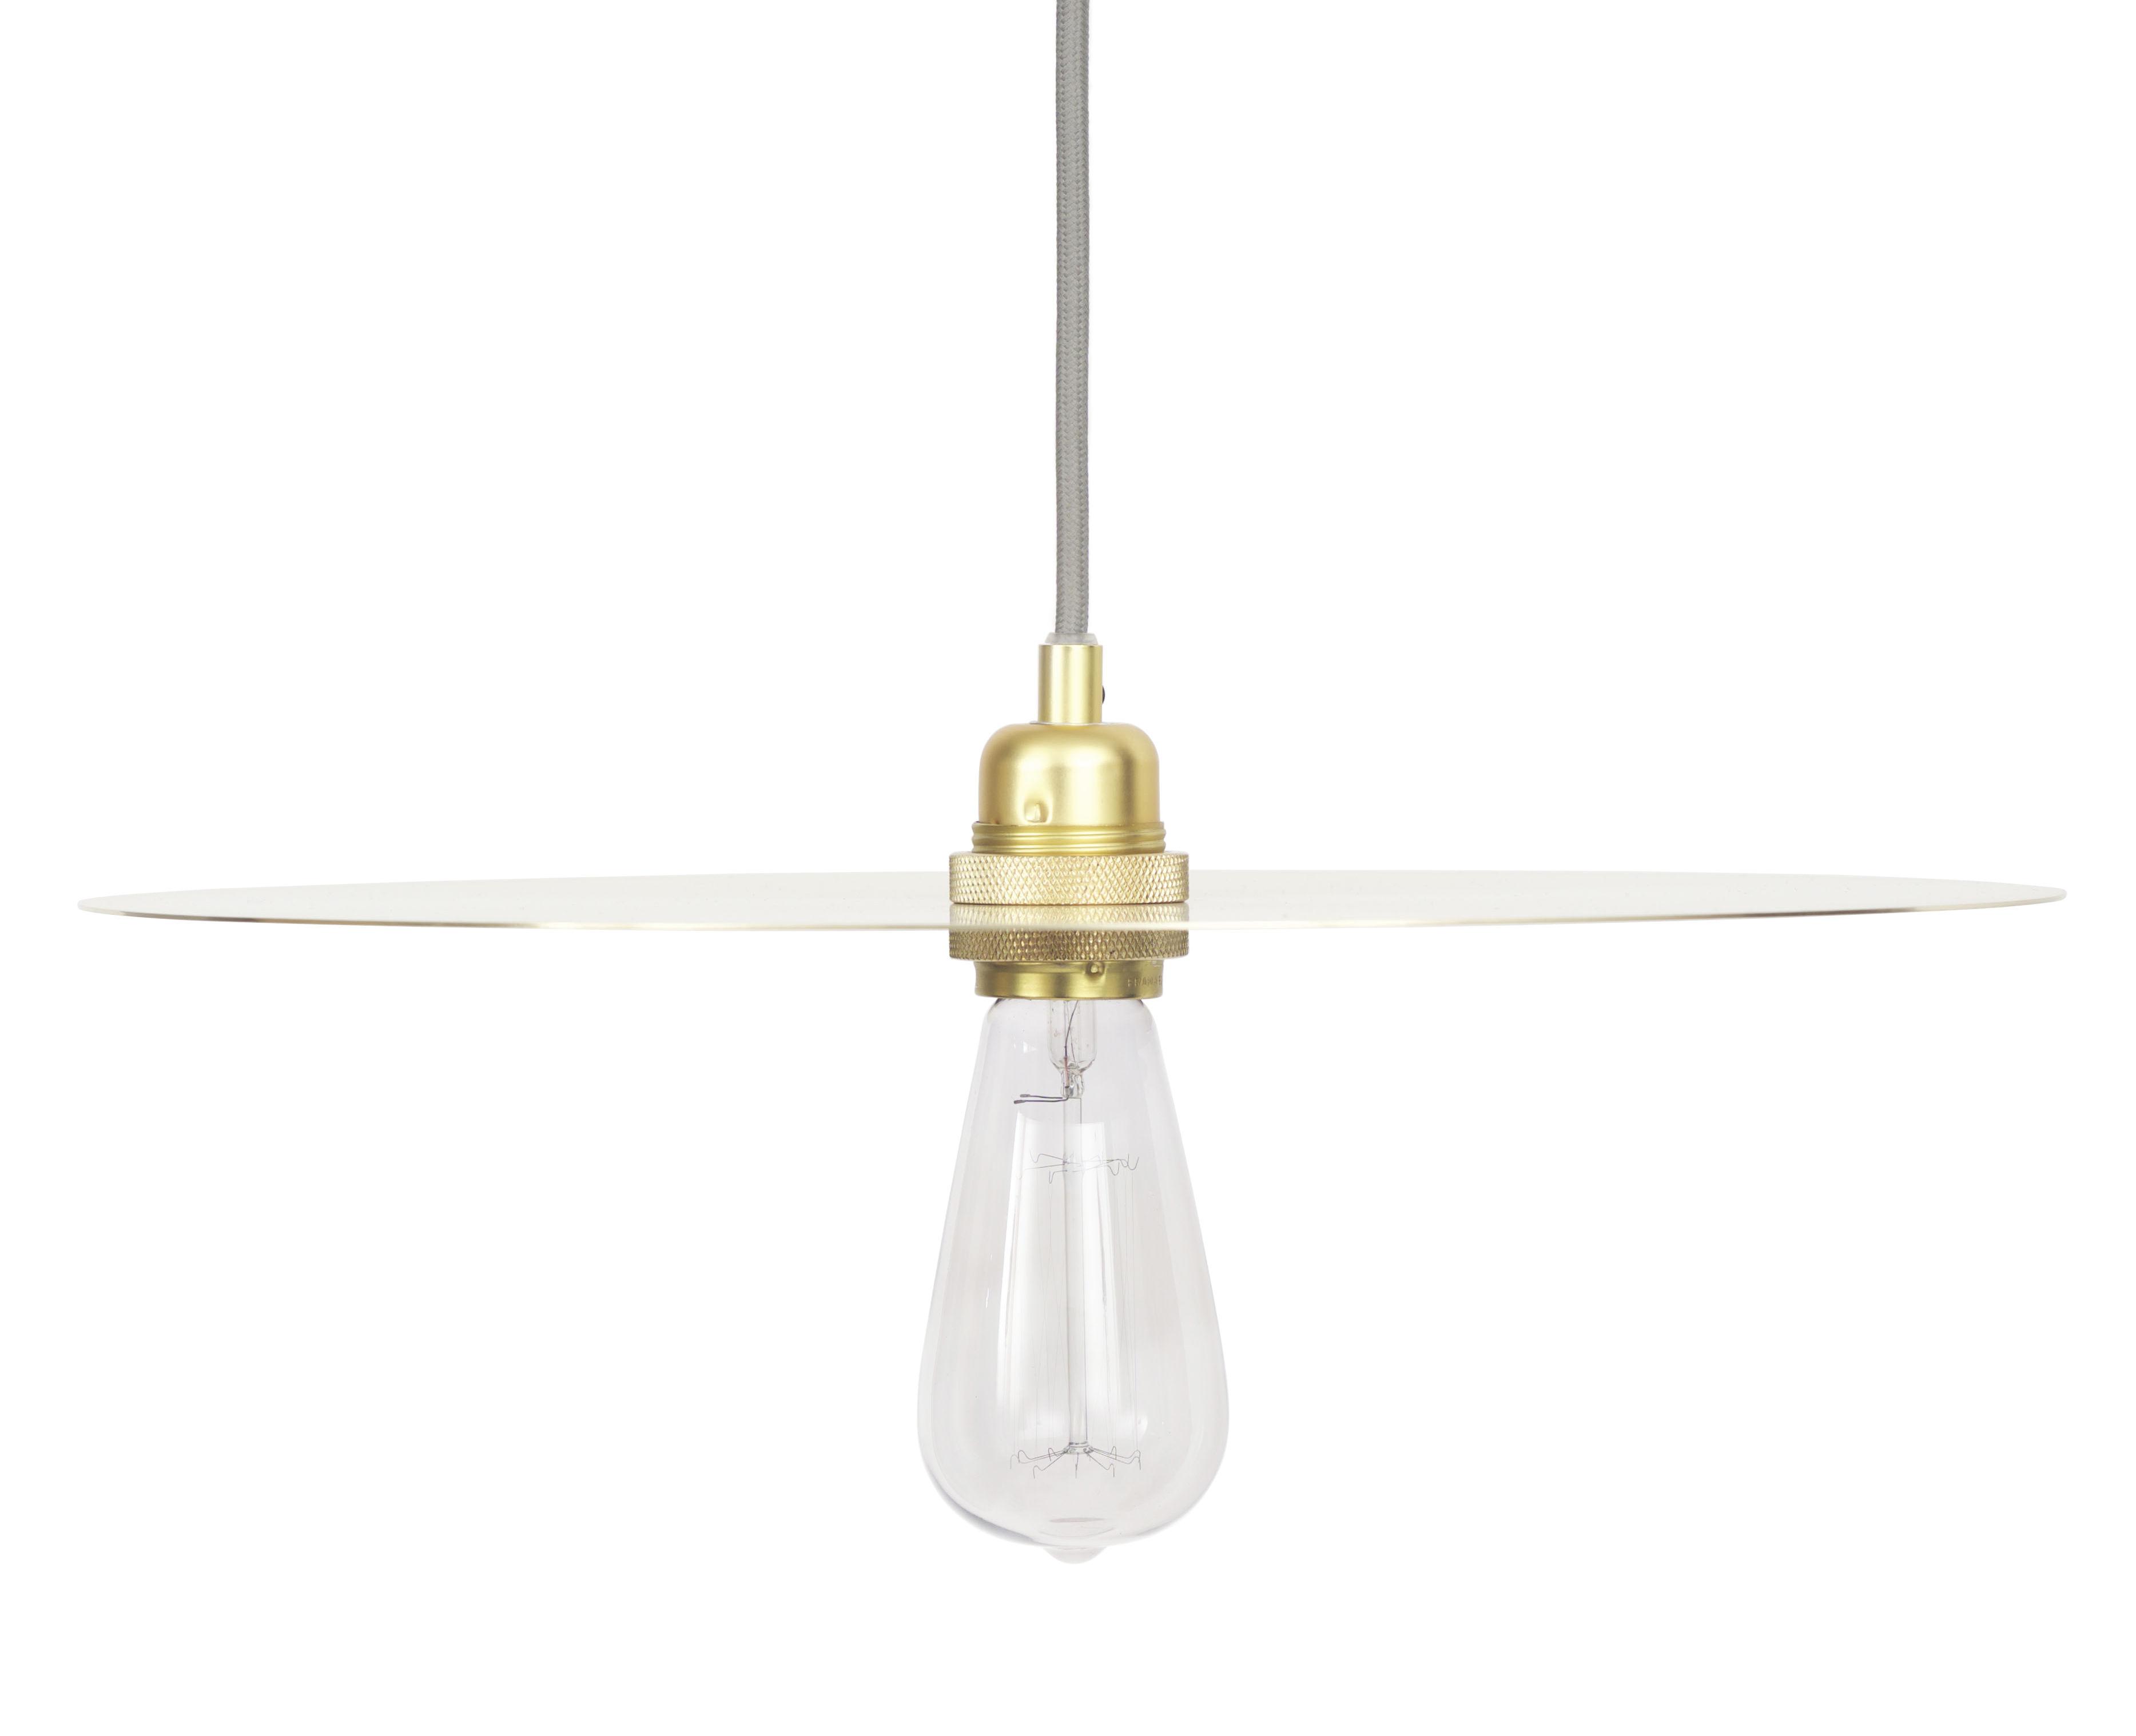 Luminaire - Suspensions - Abat-jour Circle Large / Ø 40 cm - Frama  - Large - Laiton - Laiton